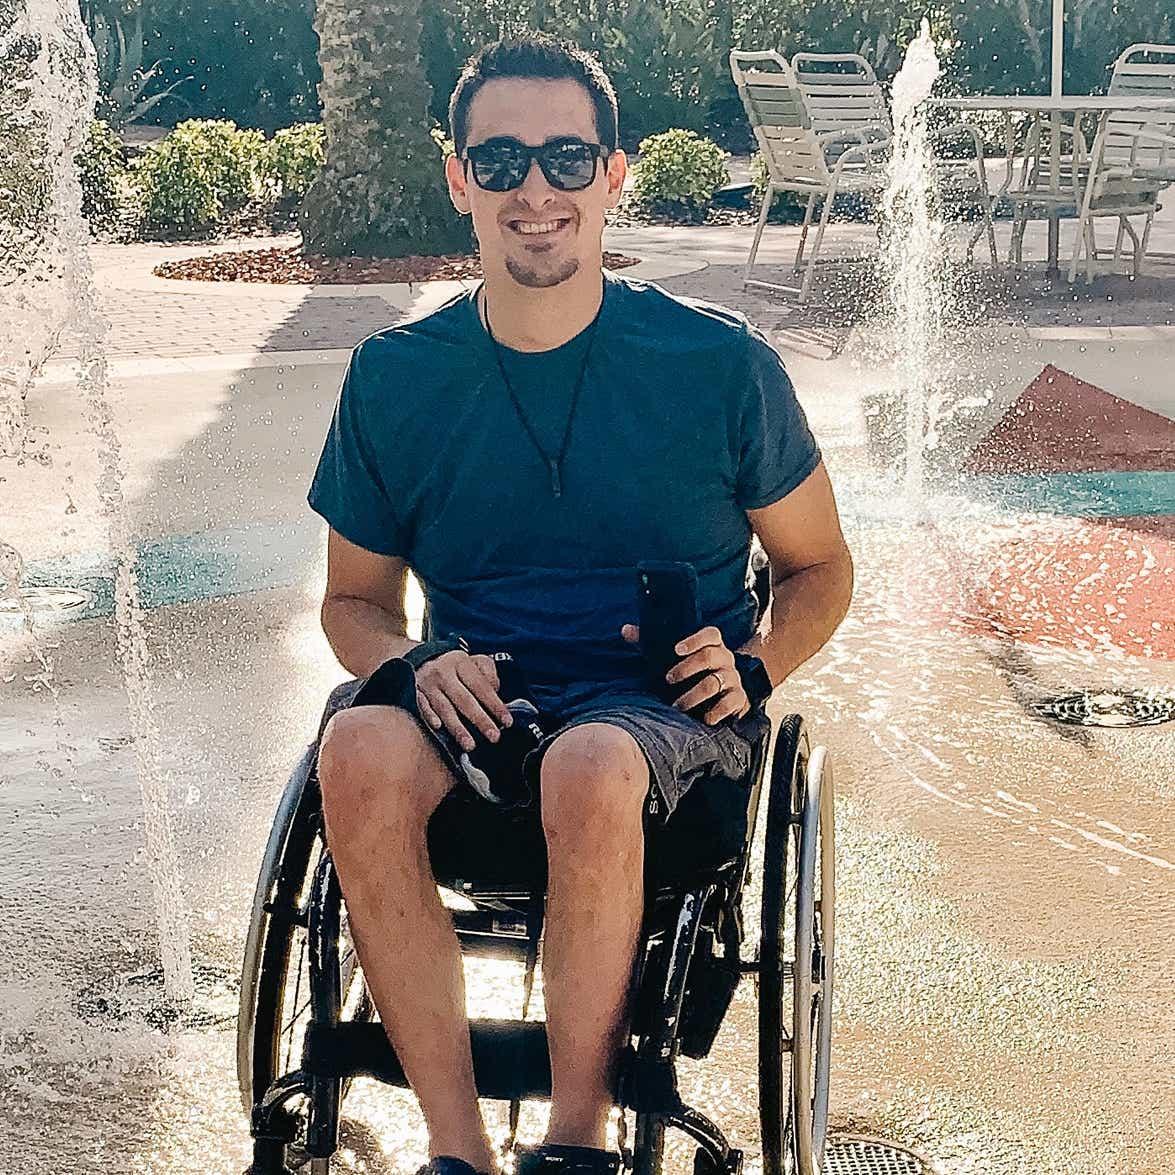 Danny Pitaluga on the splash pad at Orange Lake Resort